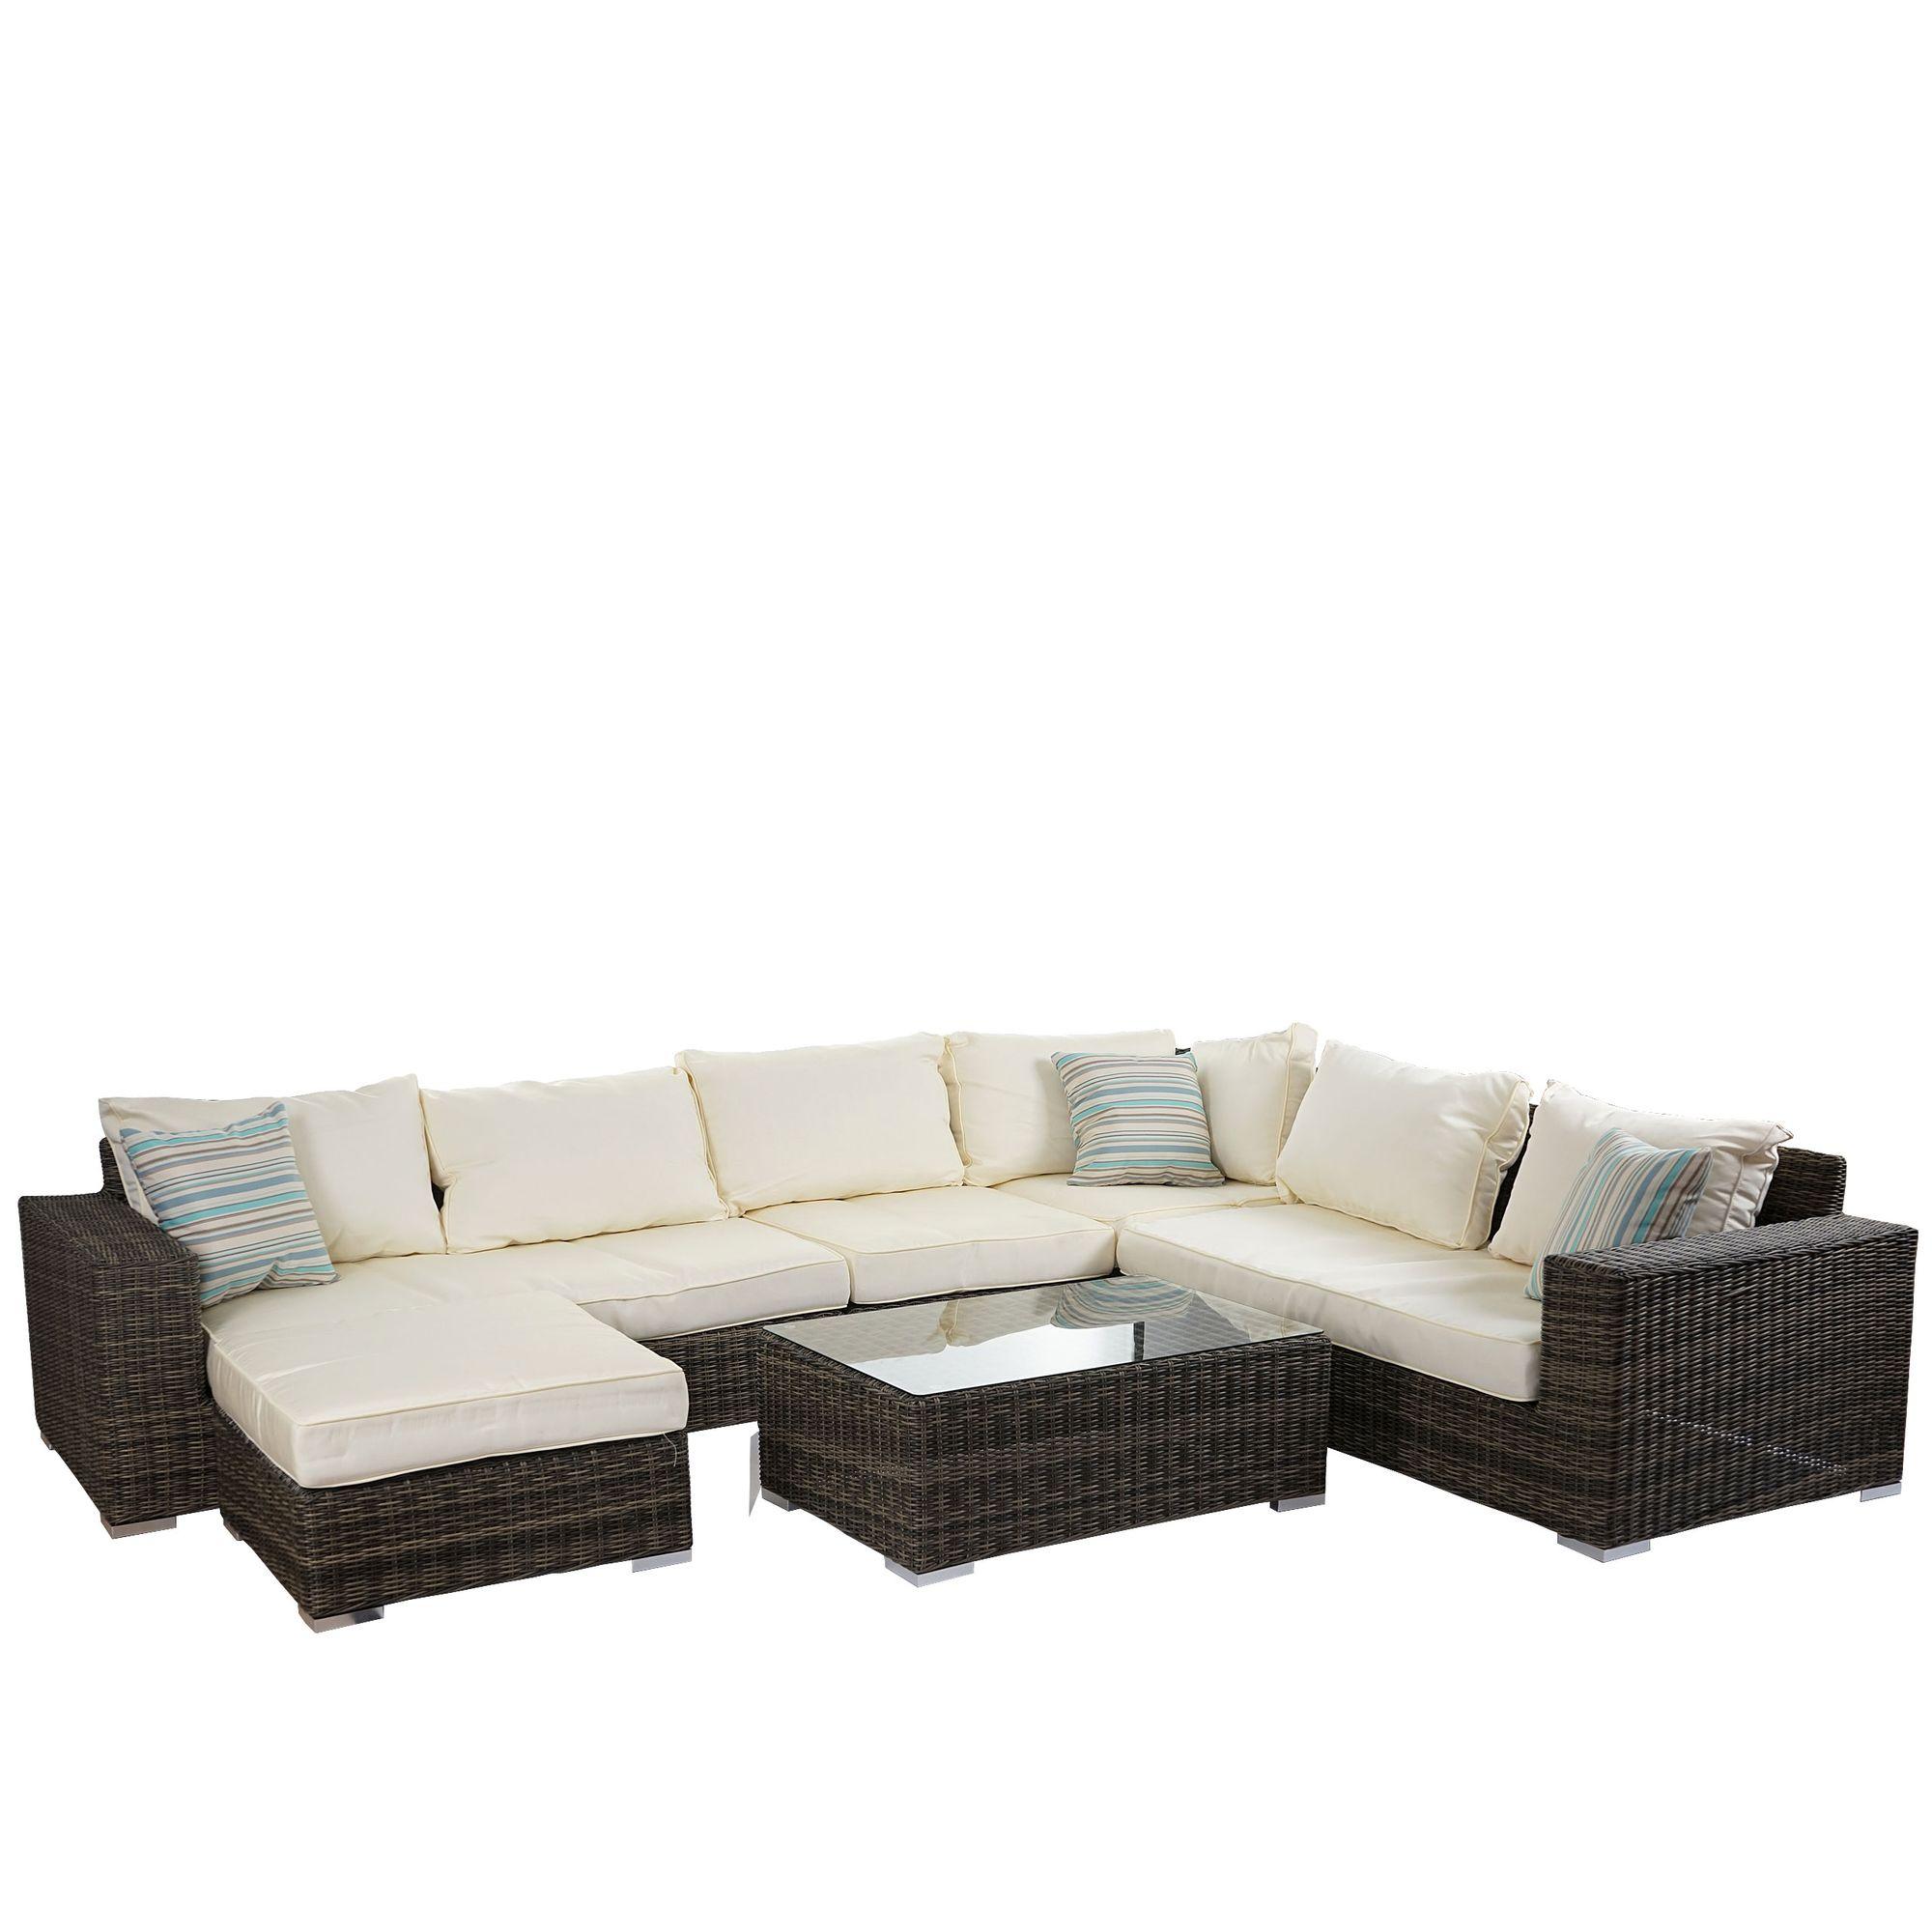 luxus poly rattan sofa garnitur melilla lounge set gartengarnitur alu gestell garten. Black Bedroom Furniture Sets. Home Design Ideas